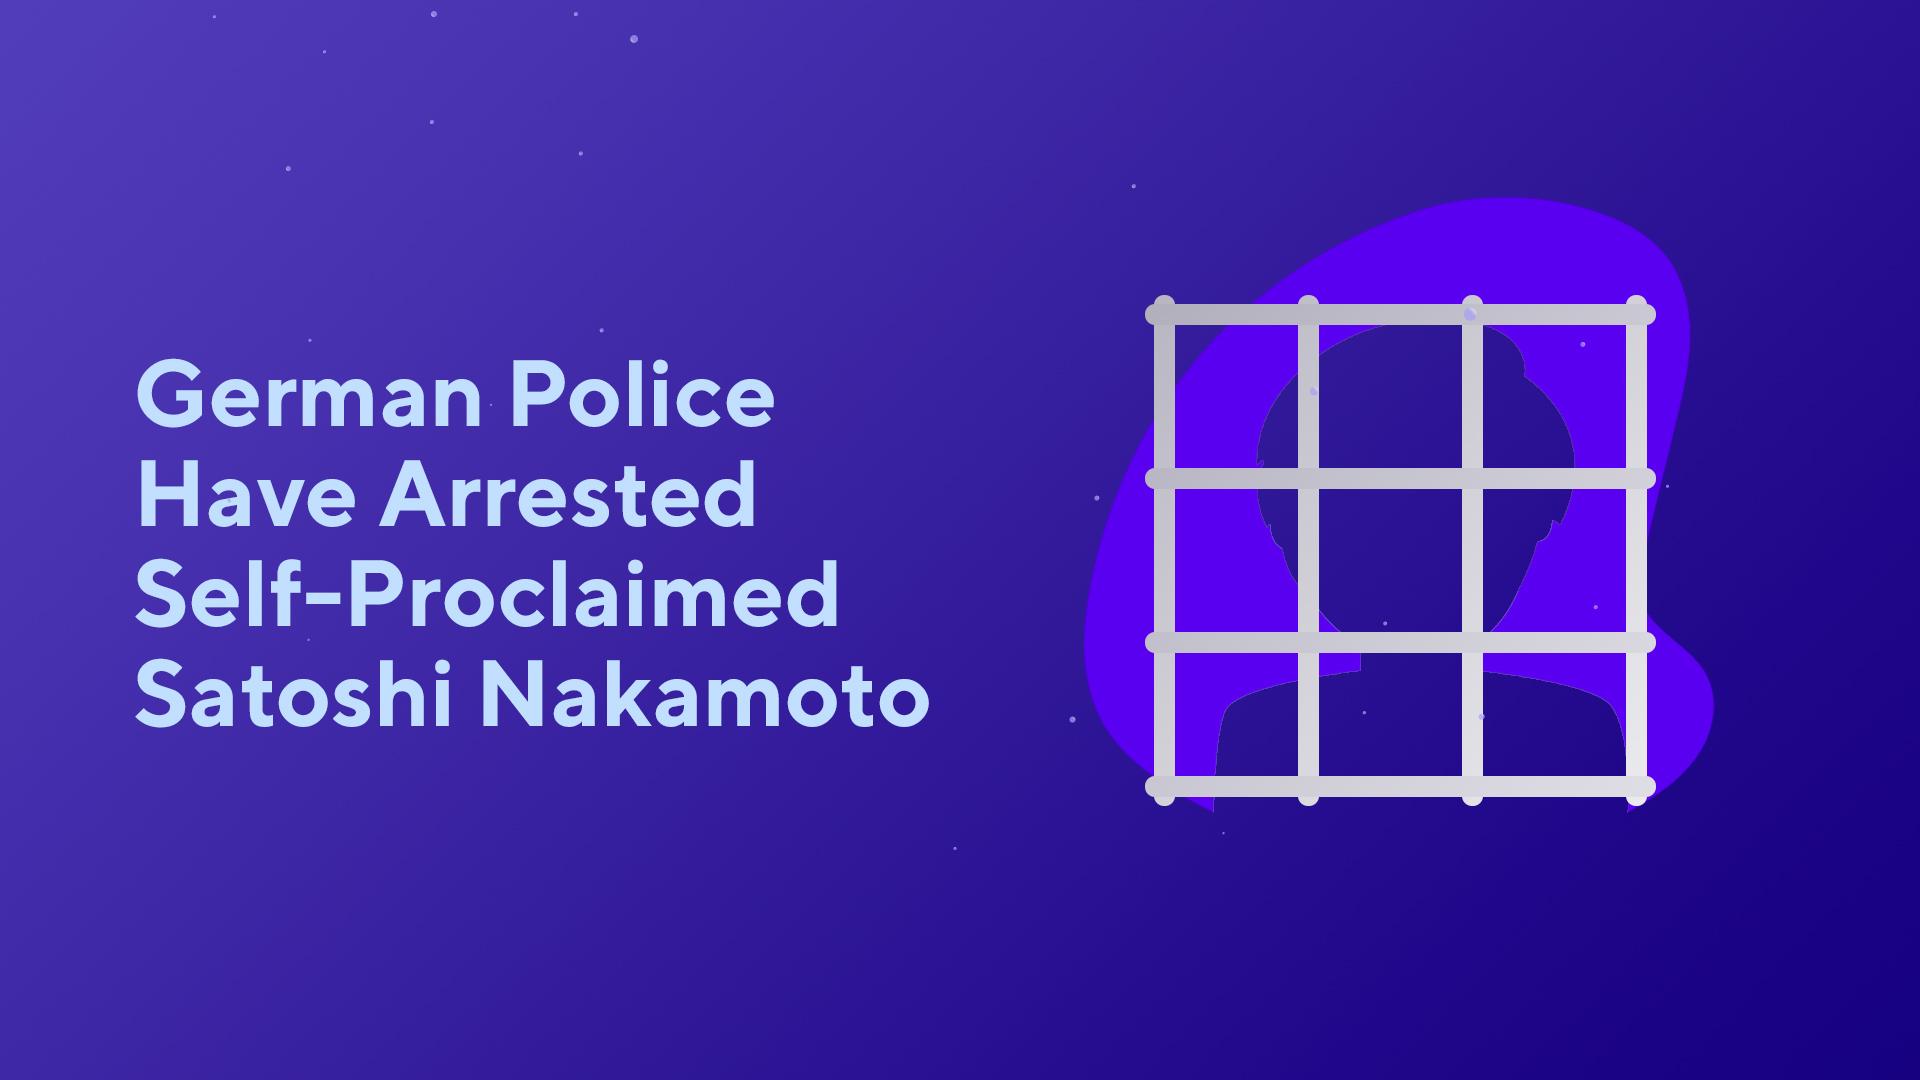 German Police Have Arrested a Self-Proclaimed Satoshi Nakamoto